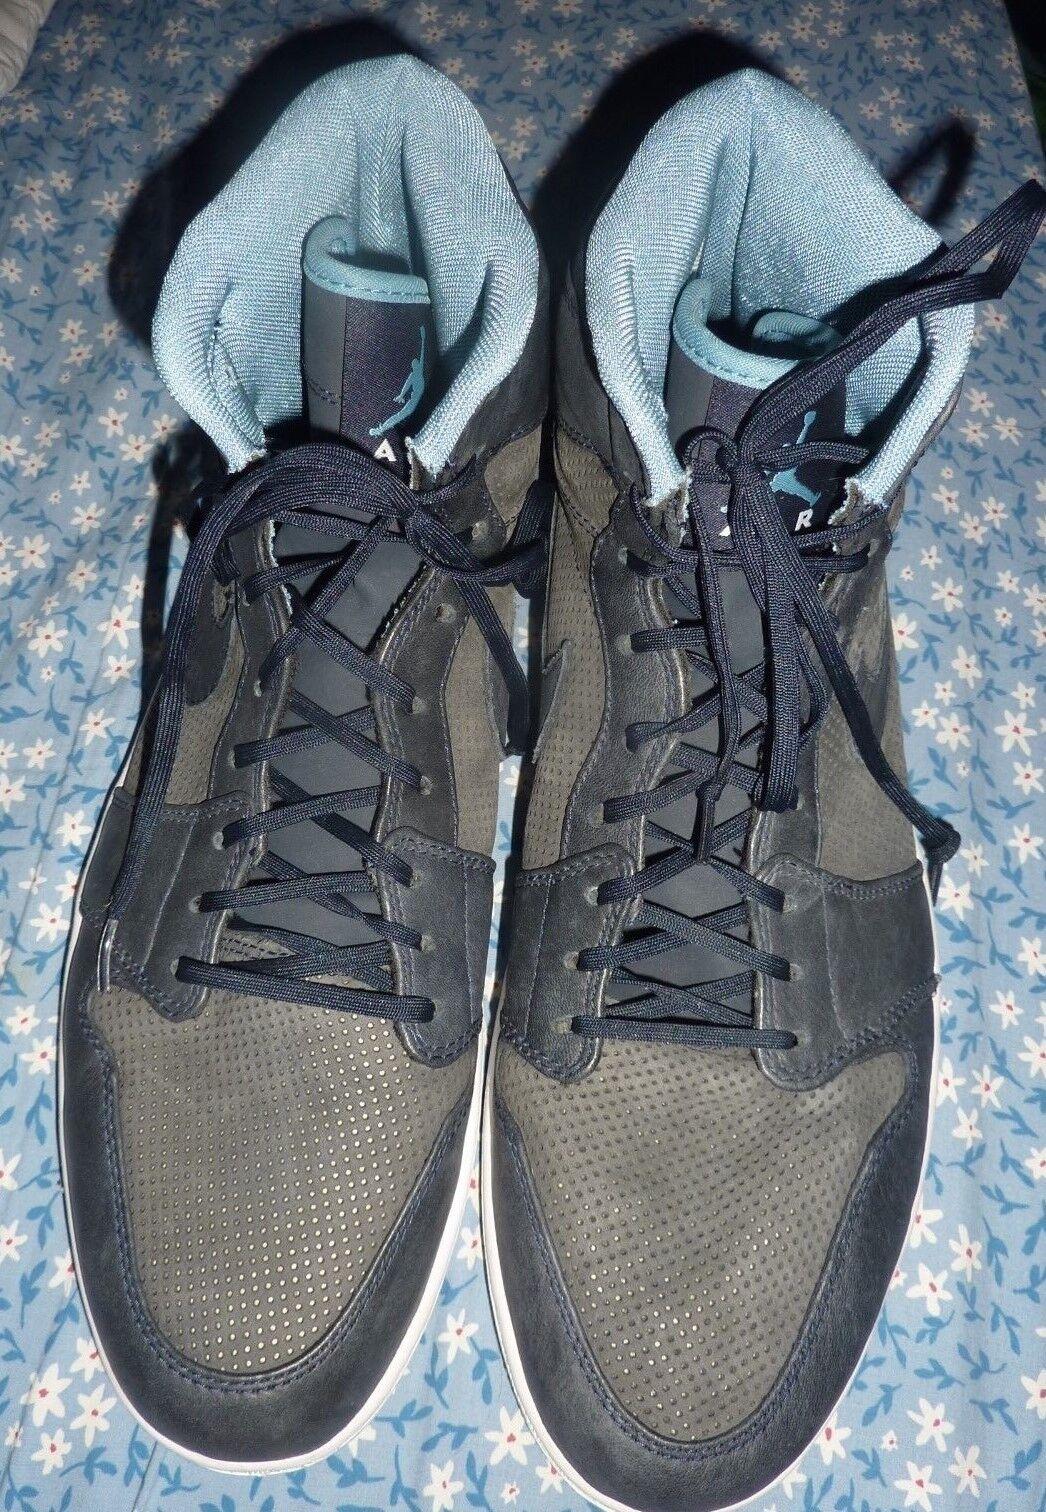 Men's AIR JORDAN Nike Air Size 15 High Tops sneakers shoes bluee